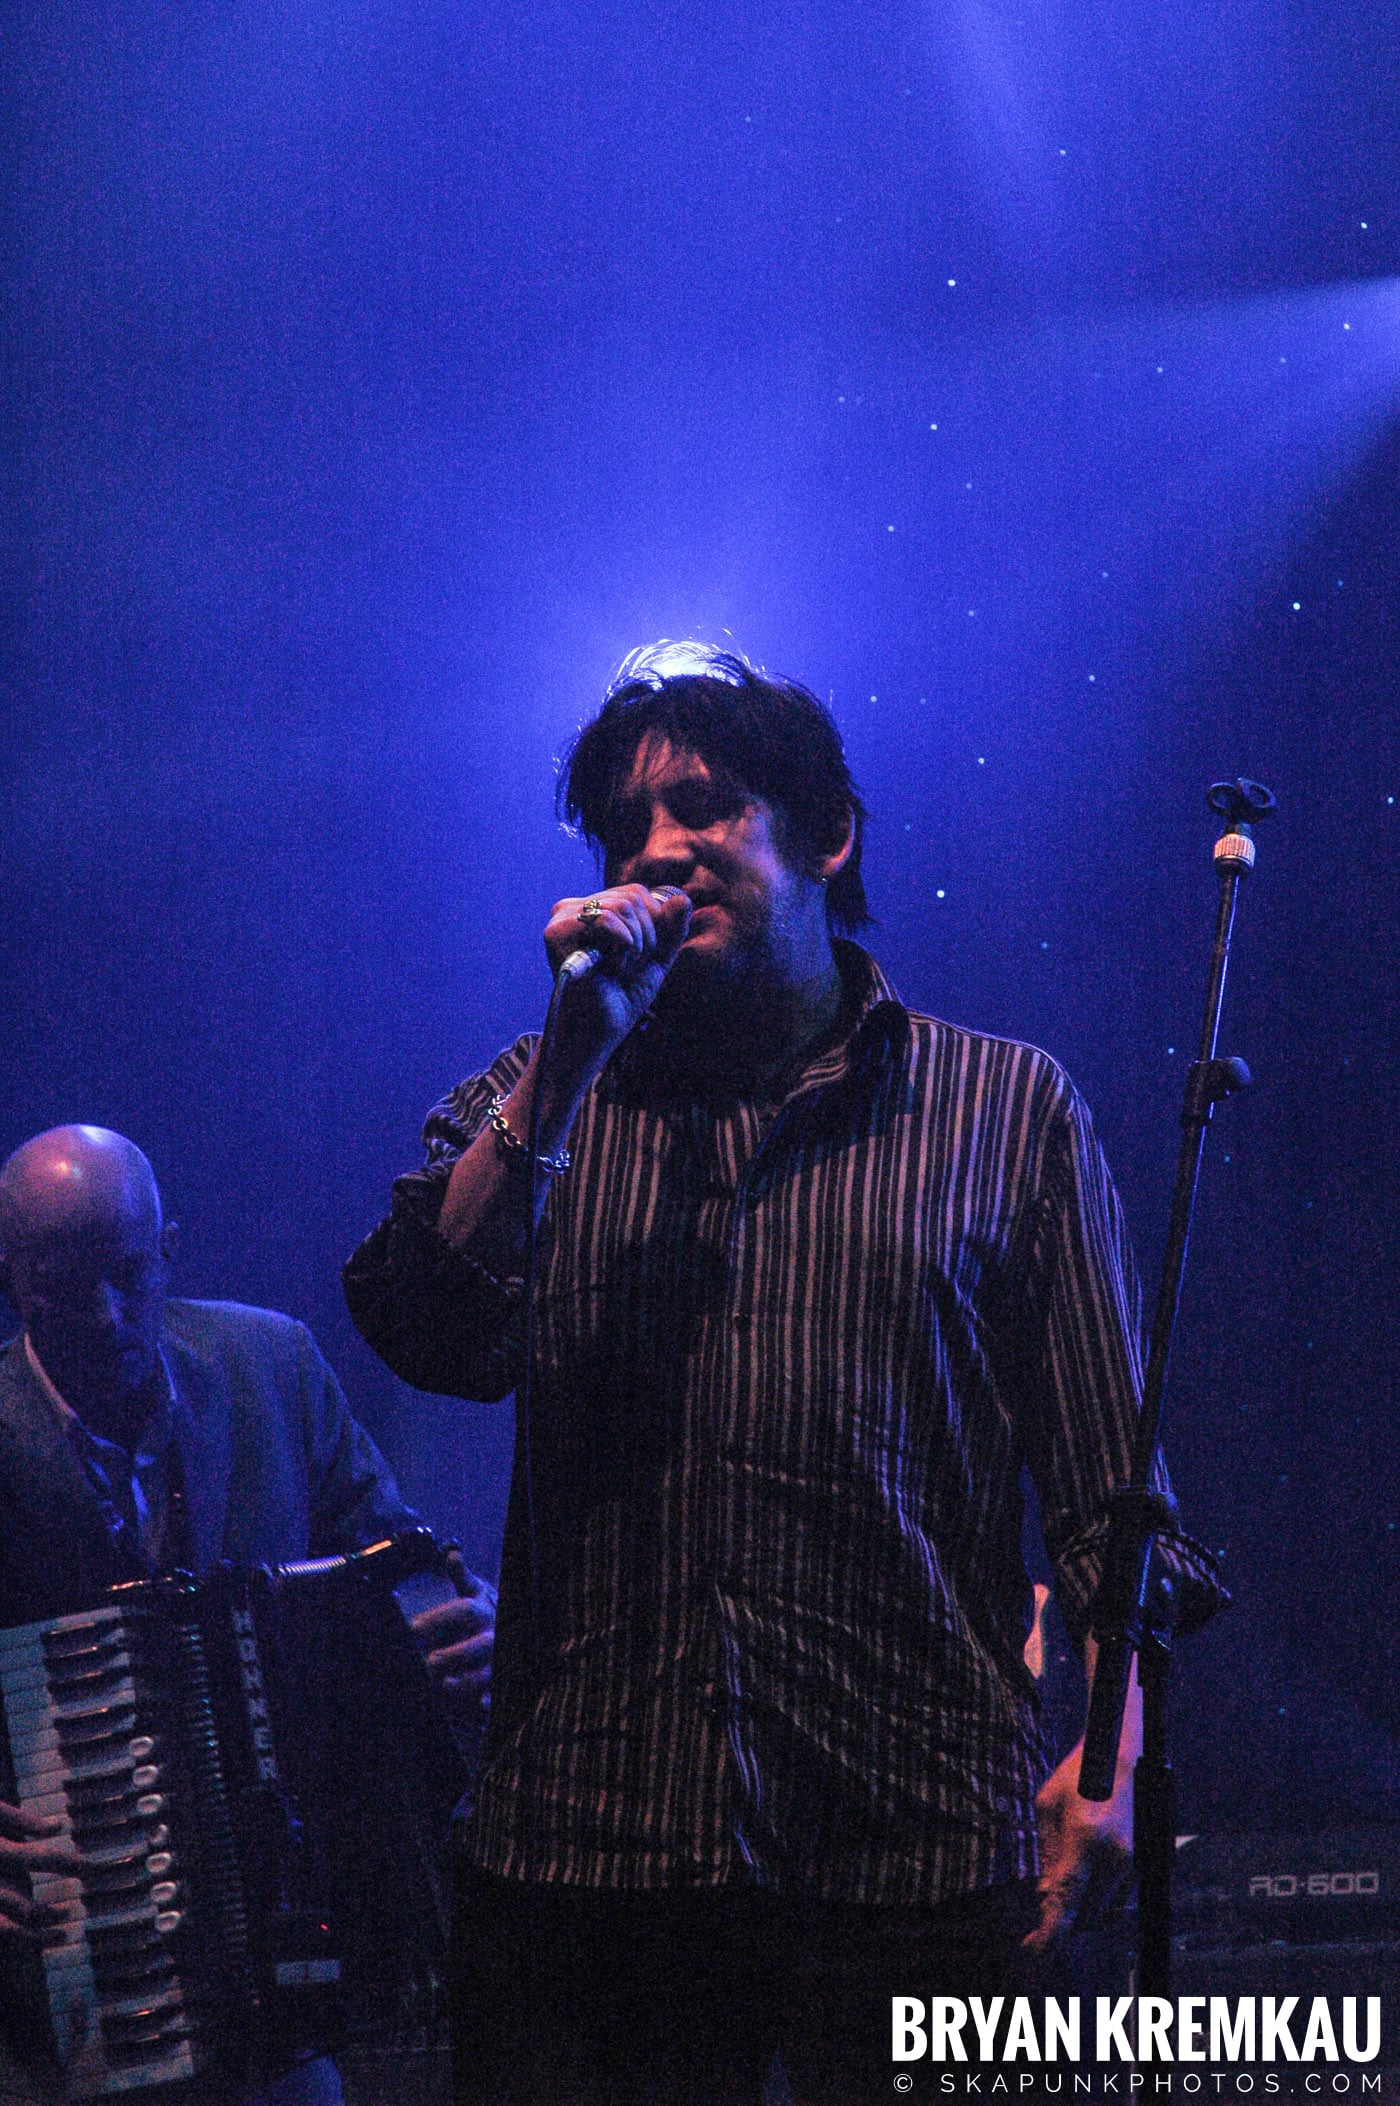 The Pogues @ Brixton Academy, London UK - 12.19.05 (24)